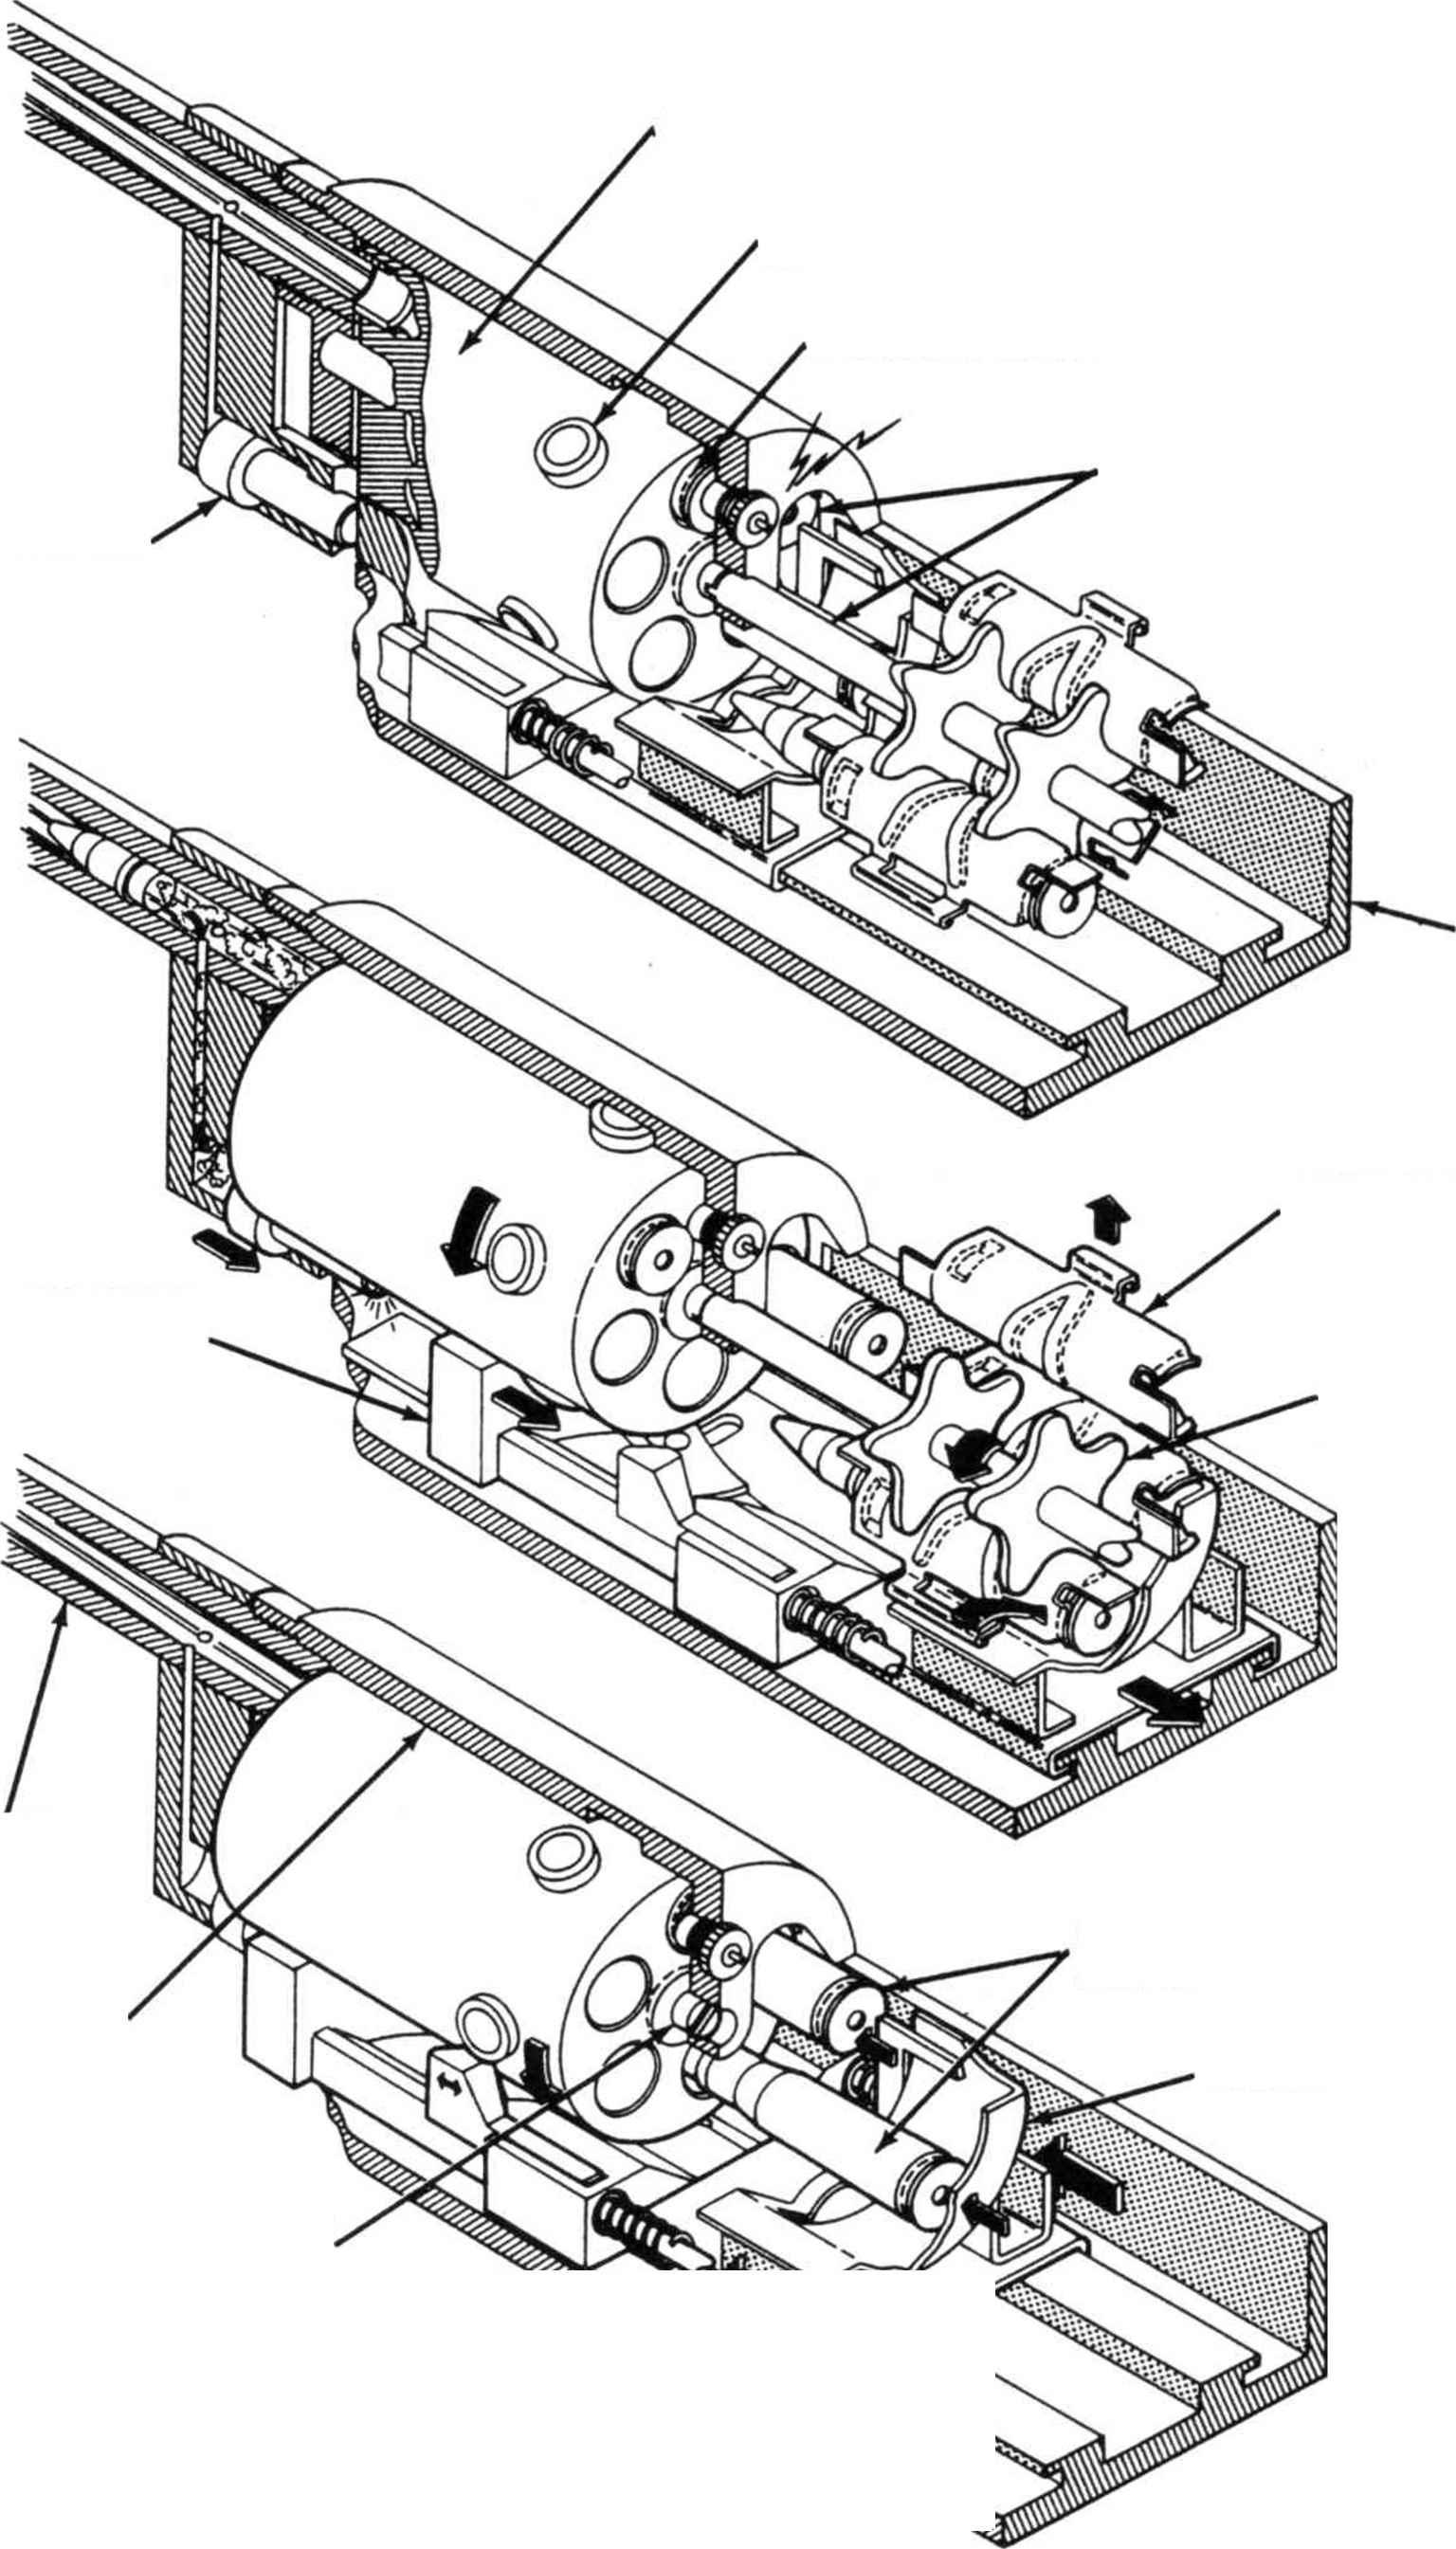 revolver cannon - heavy machine guns